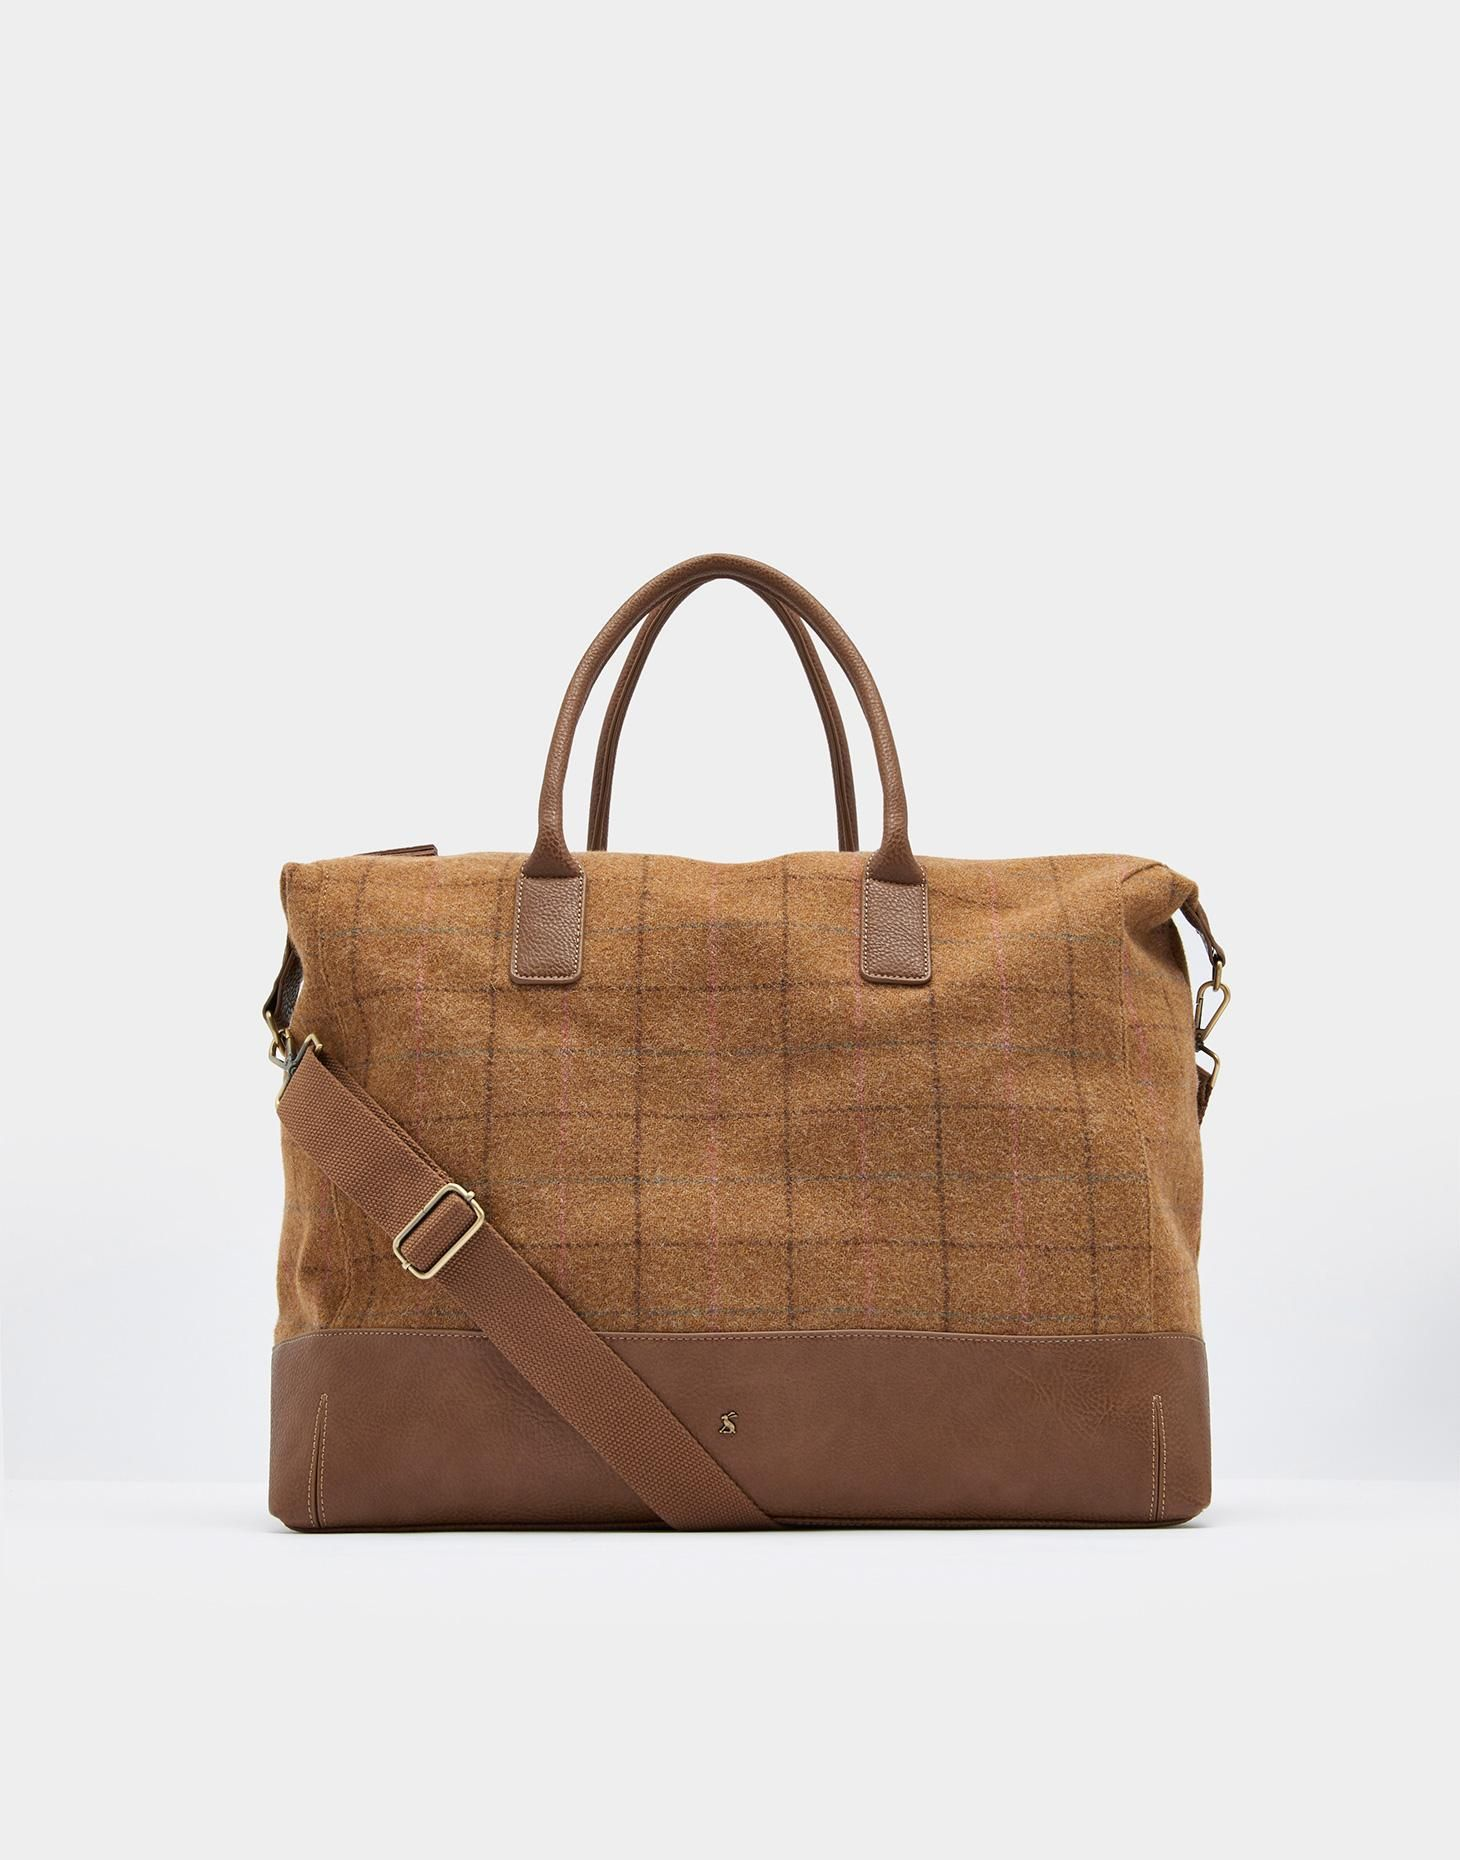 416dbbfb9910 Joules Paddington Tan Check Tweed Weekend Bag | accessories in 2019 ...